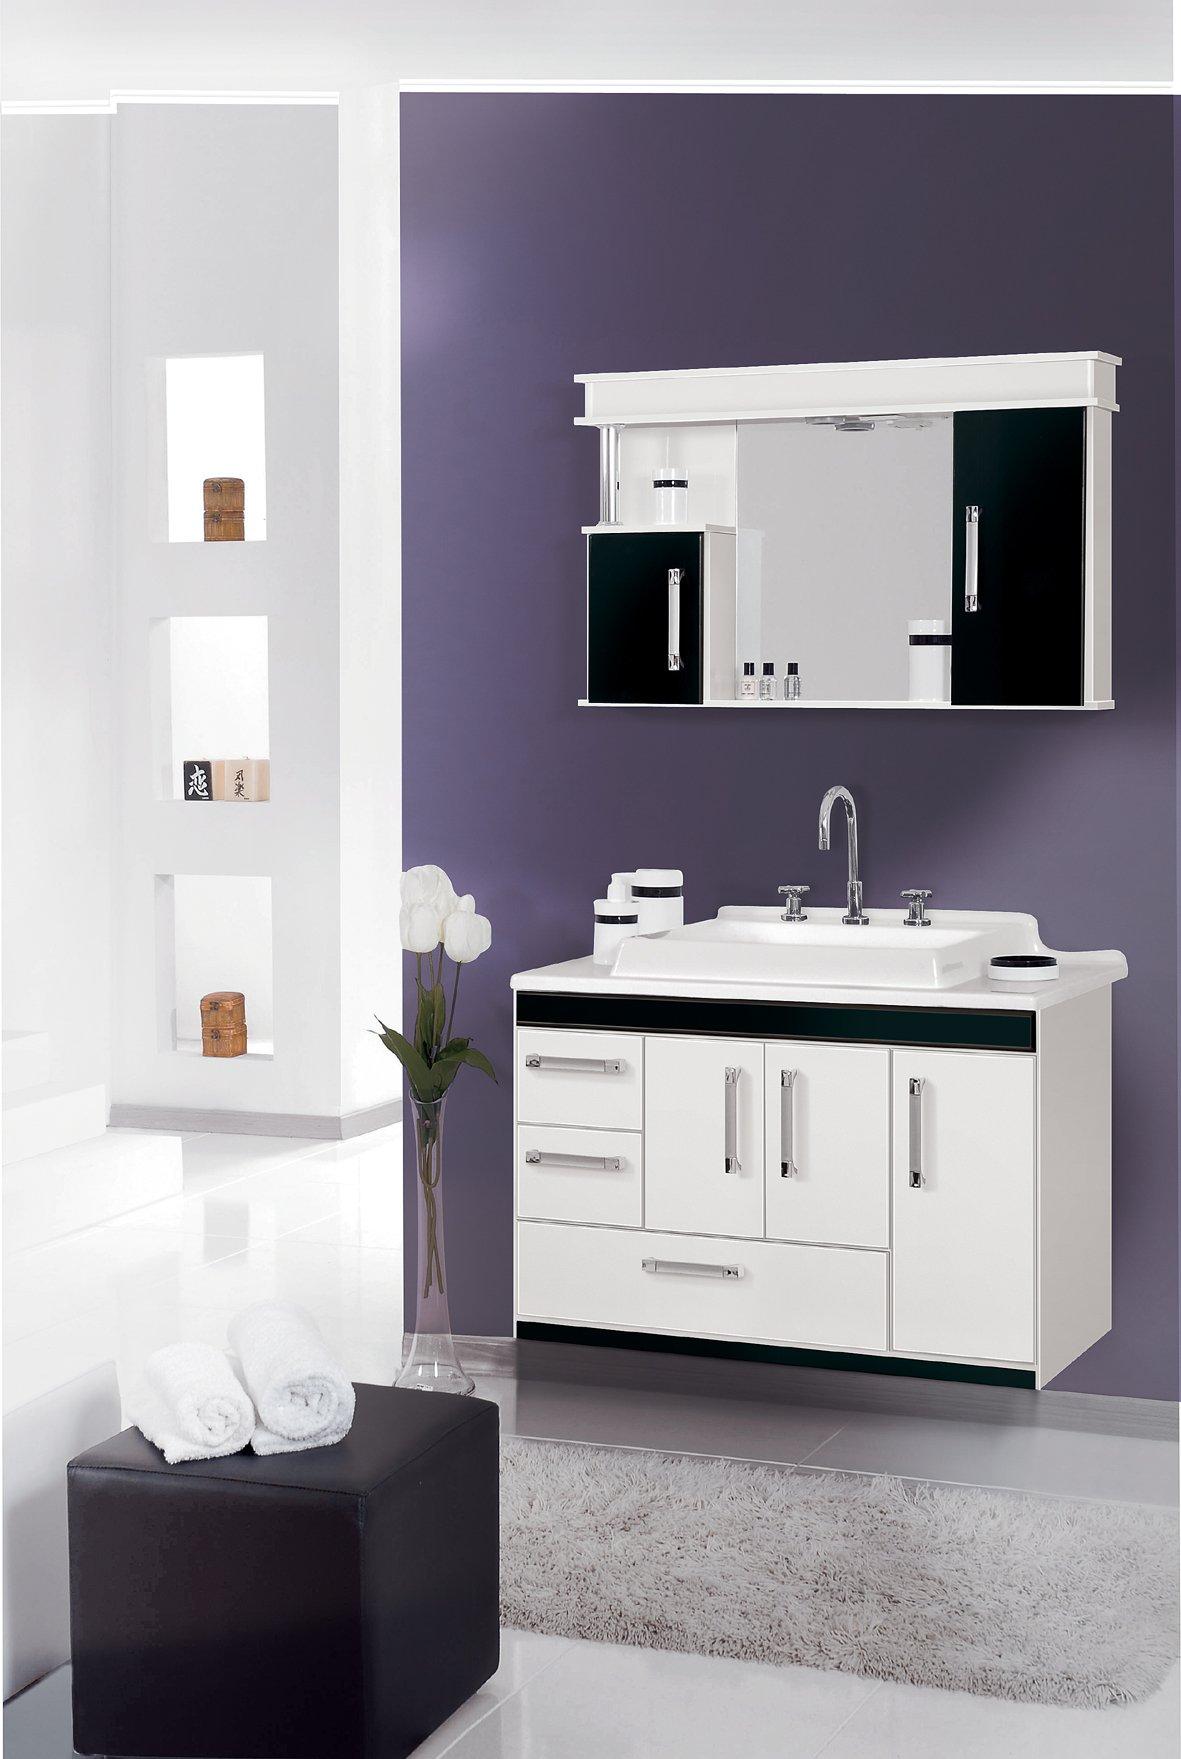 Free Images : room, interior design, bathroom, accommodation ...